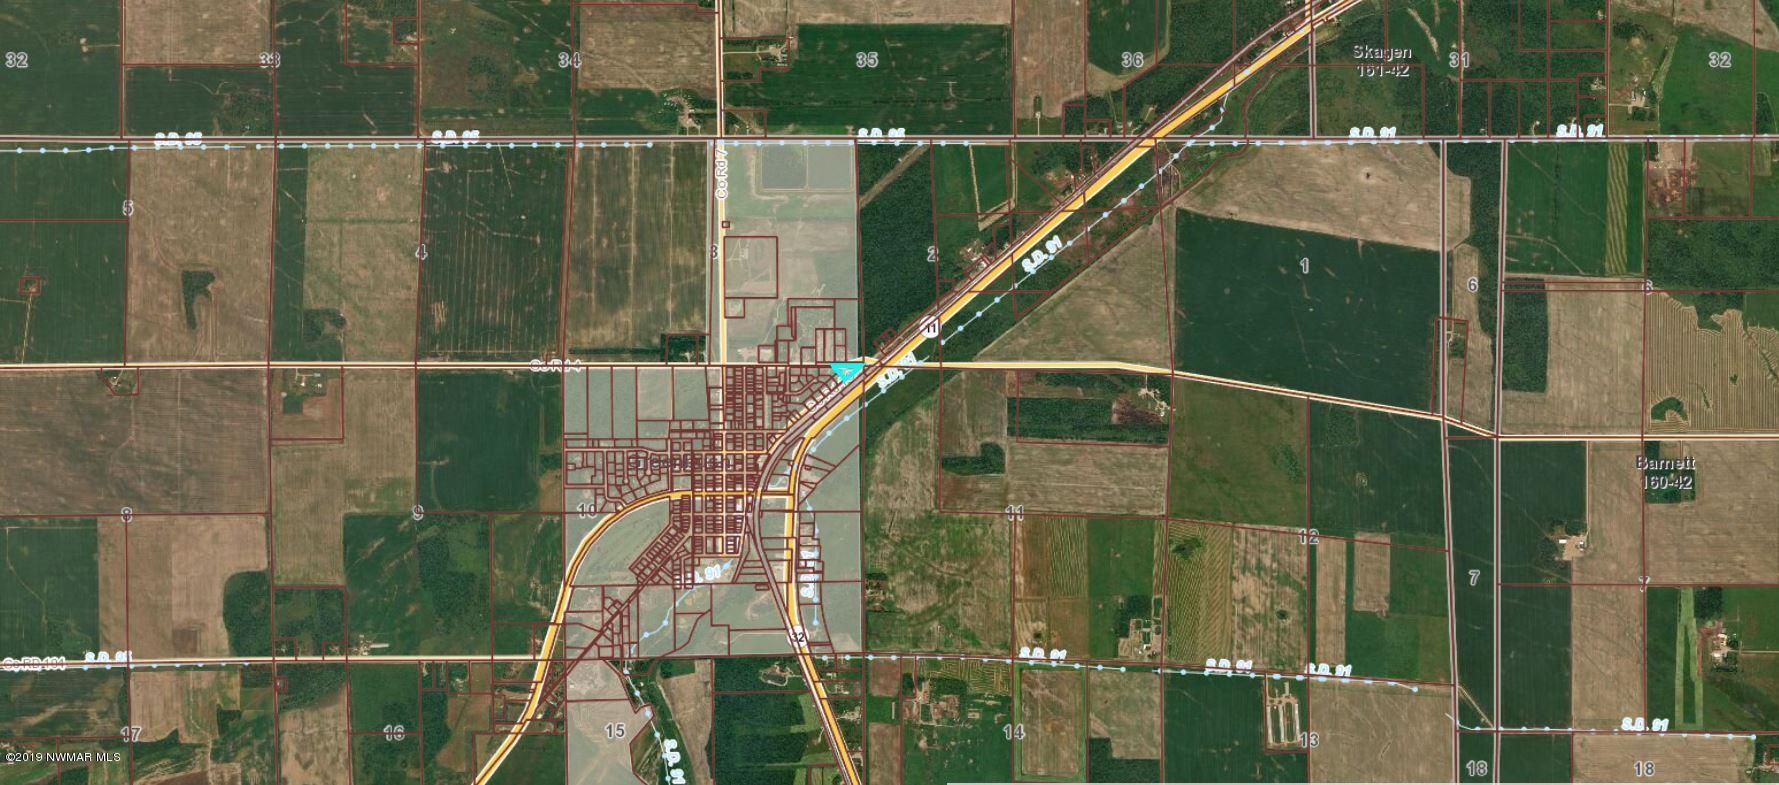 417 Old Hwy 11 Highway E, Greenbush, MN 56726